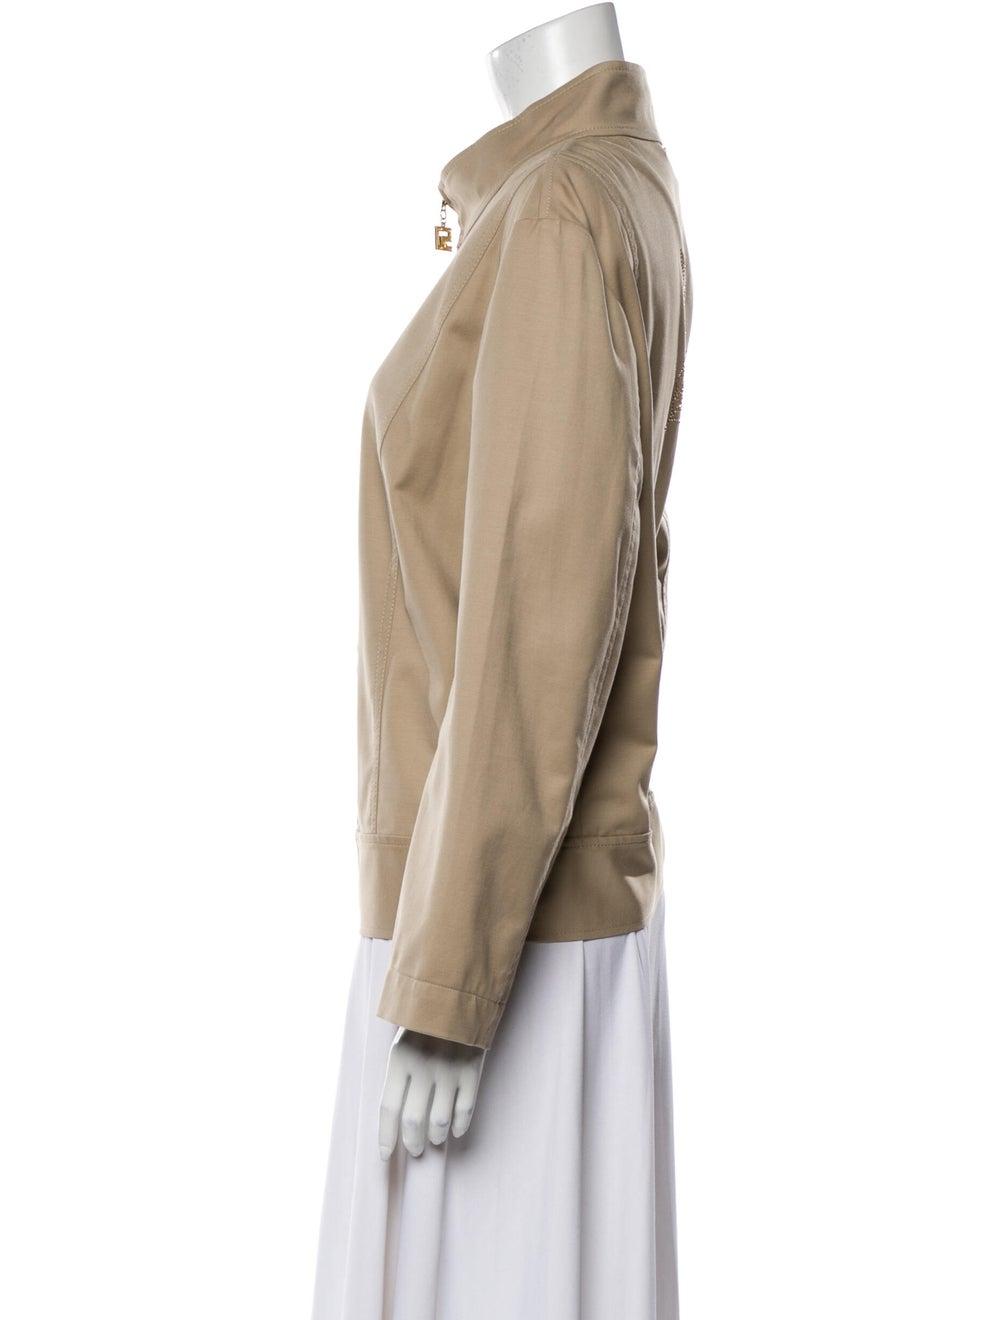 St. John Sport Jacket - image 2